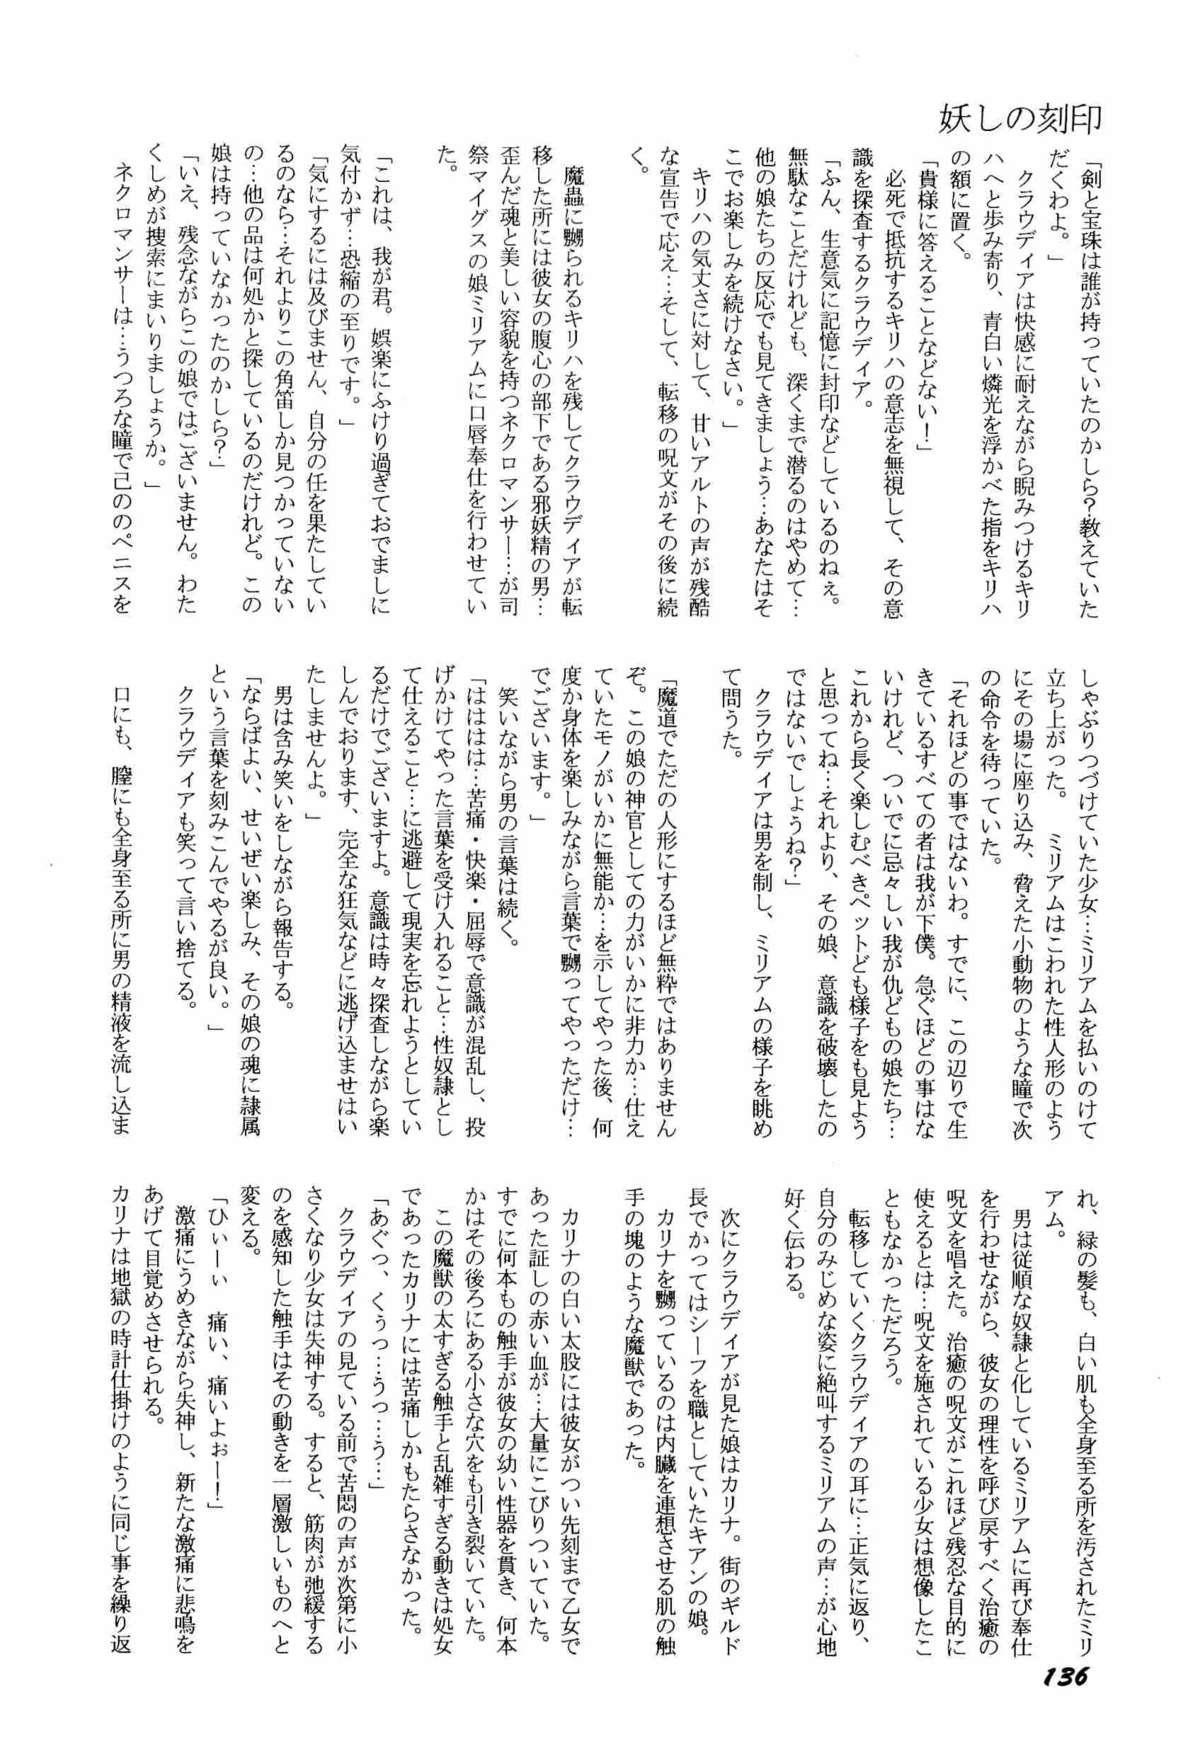 Bisyoujo Anthology '93 jyoukan 138